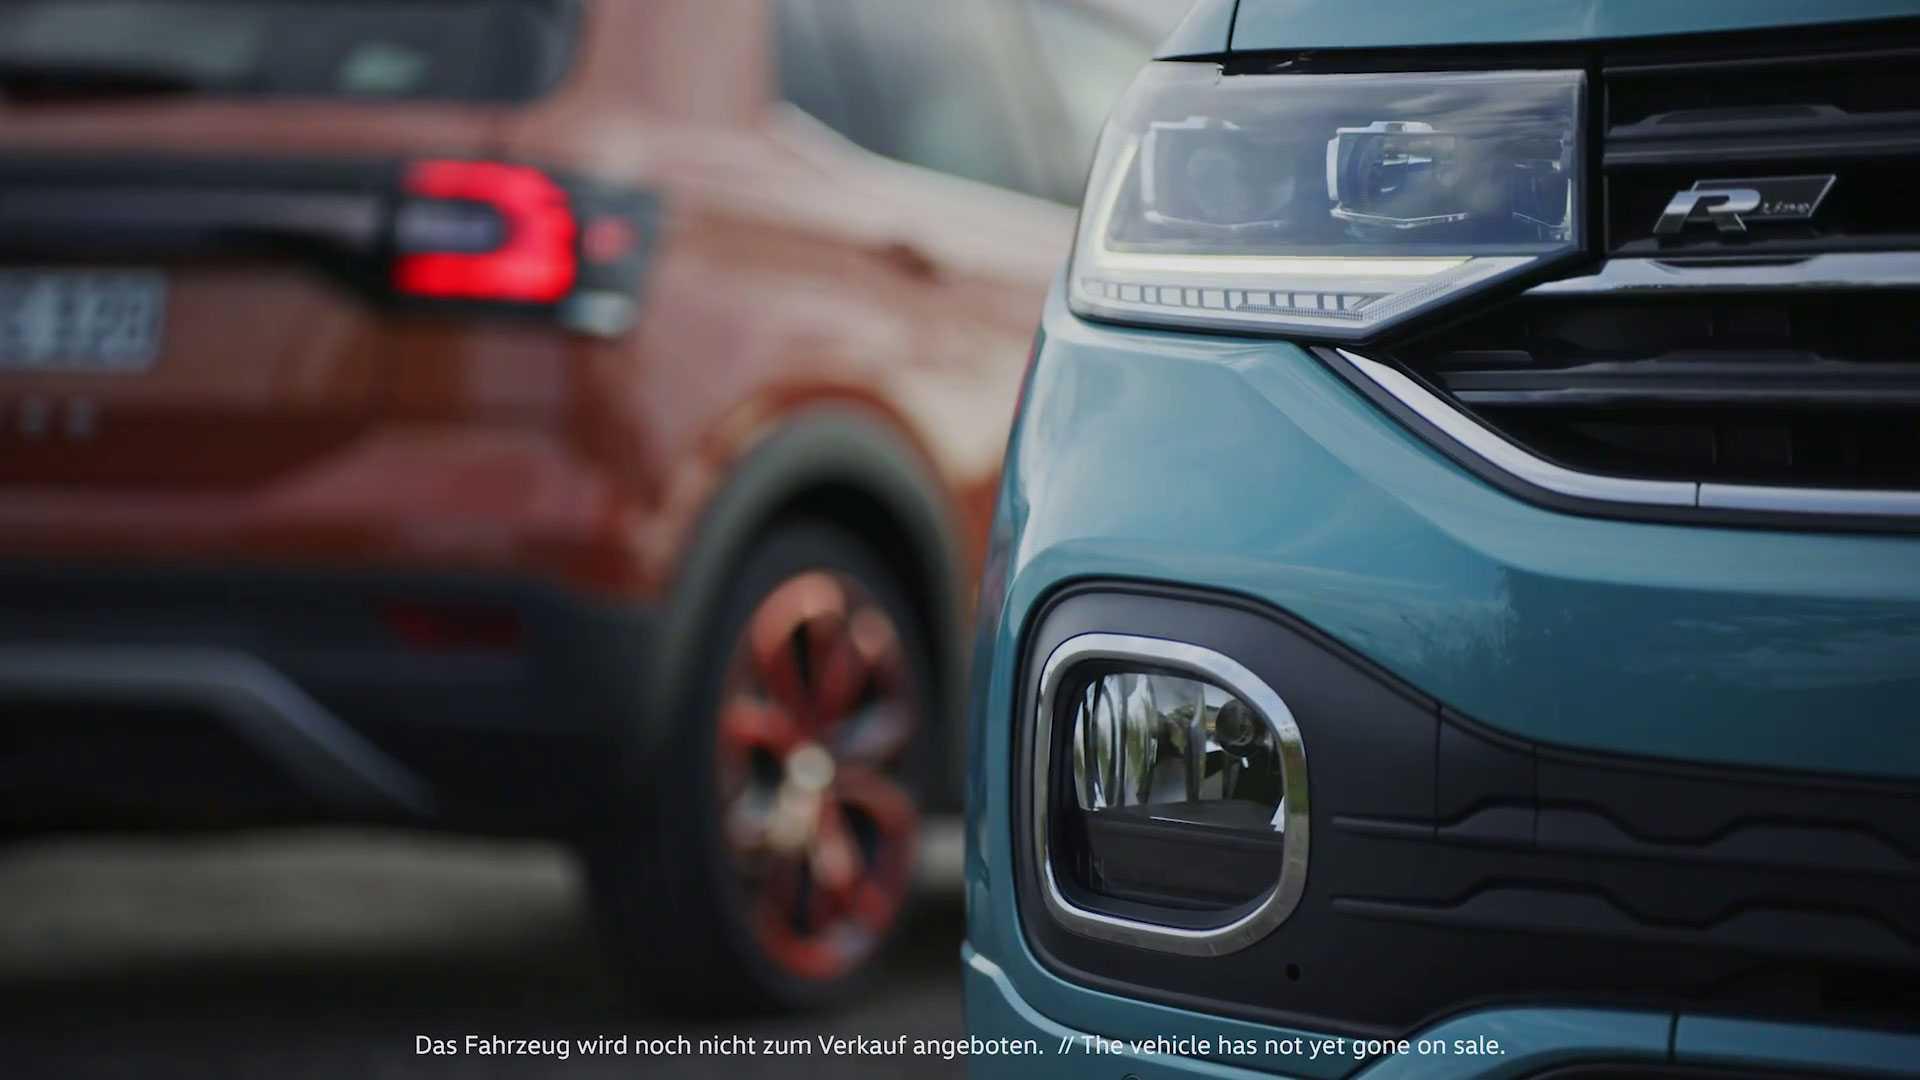 Premijera Volkswagen T-Crossa uživo (VIDEO)